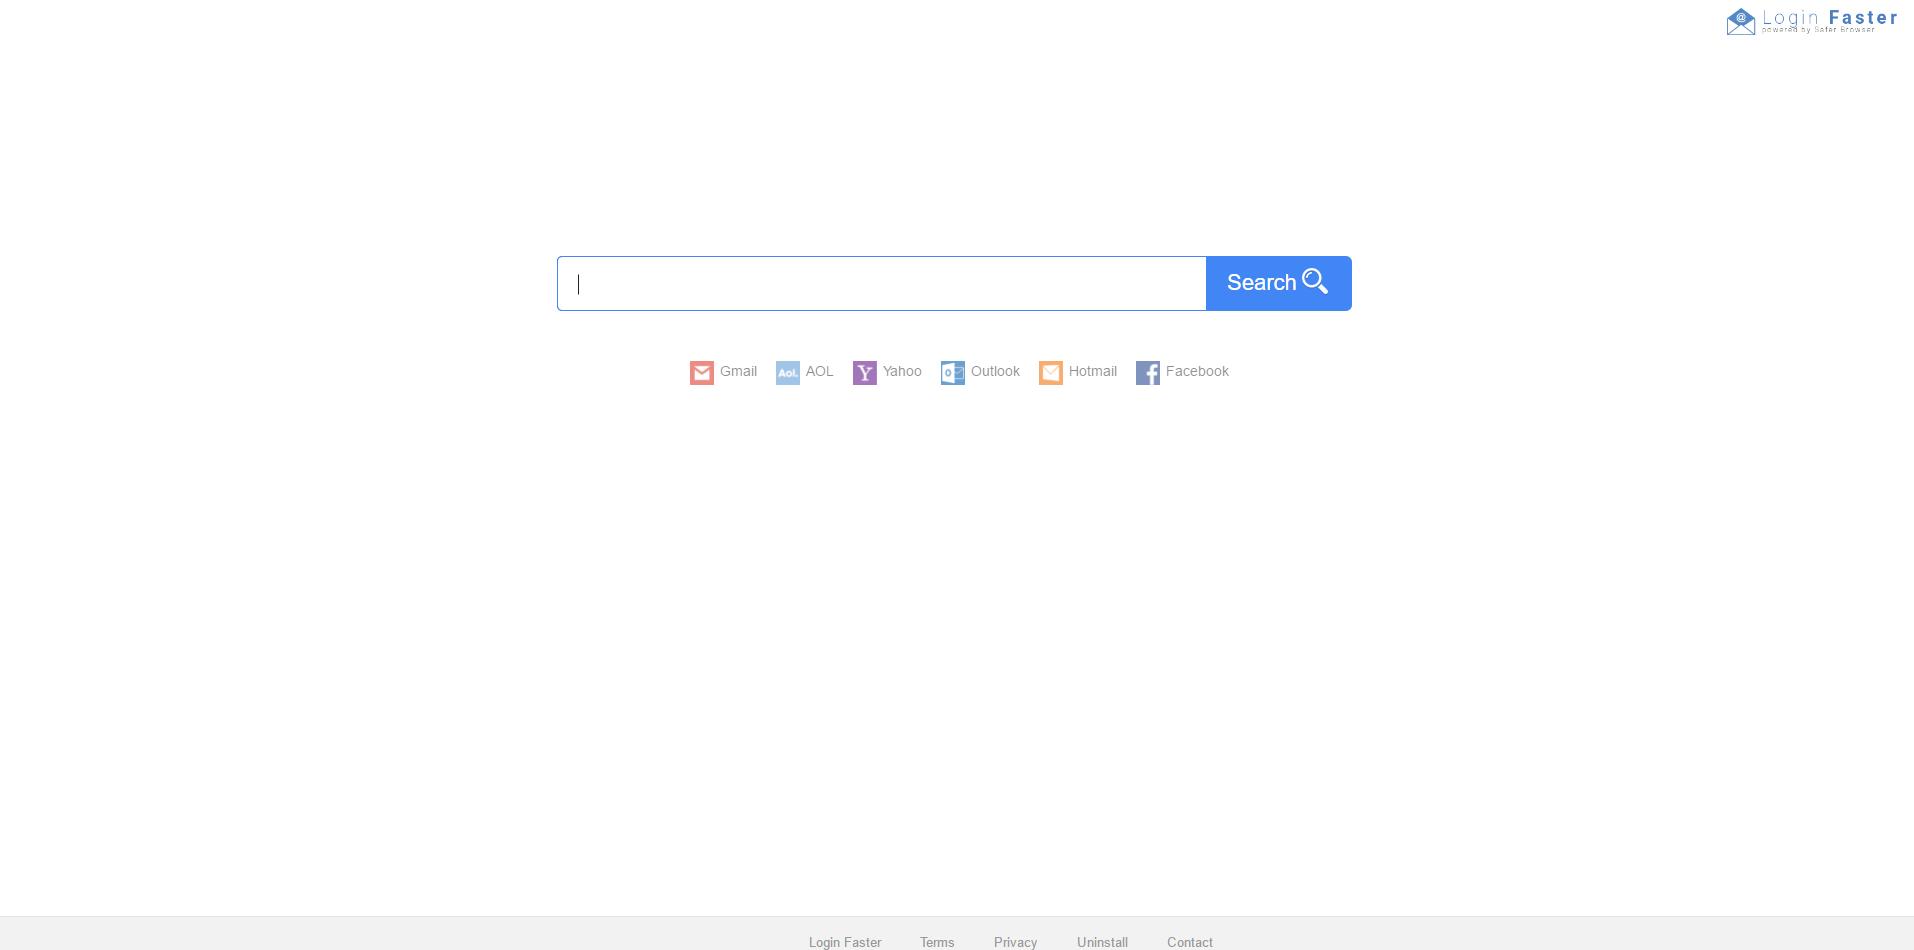 Search.searchlf.com Ads